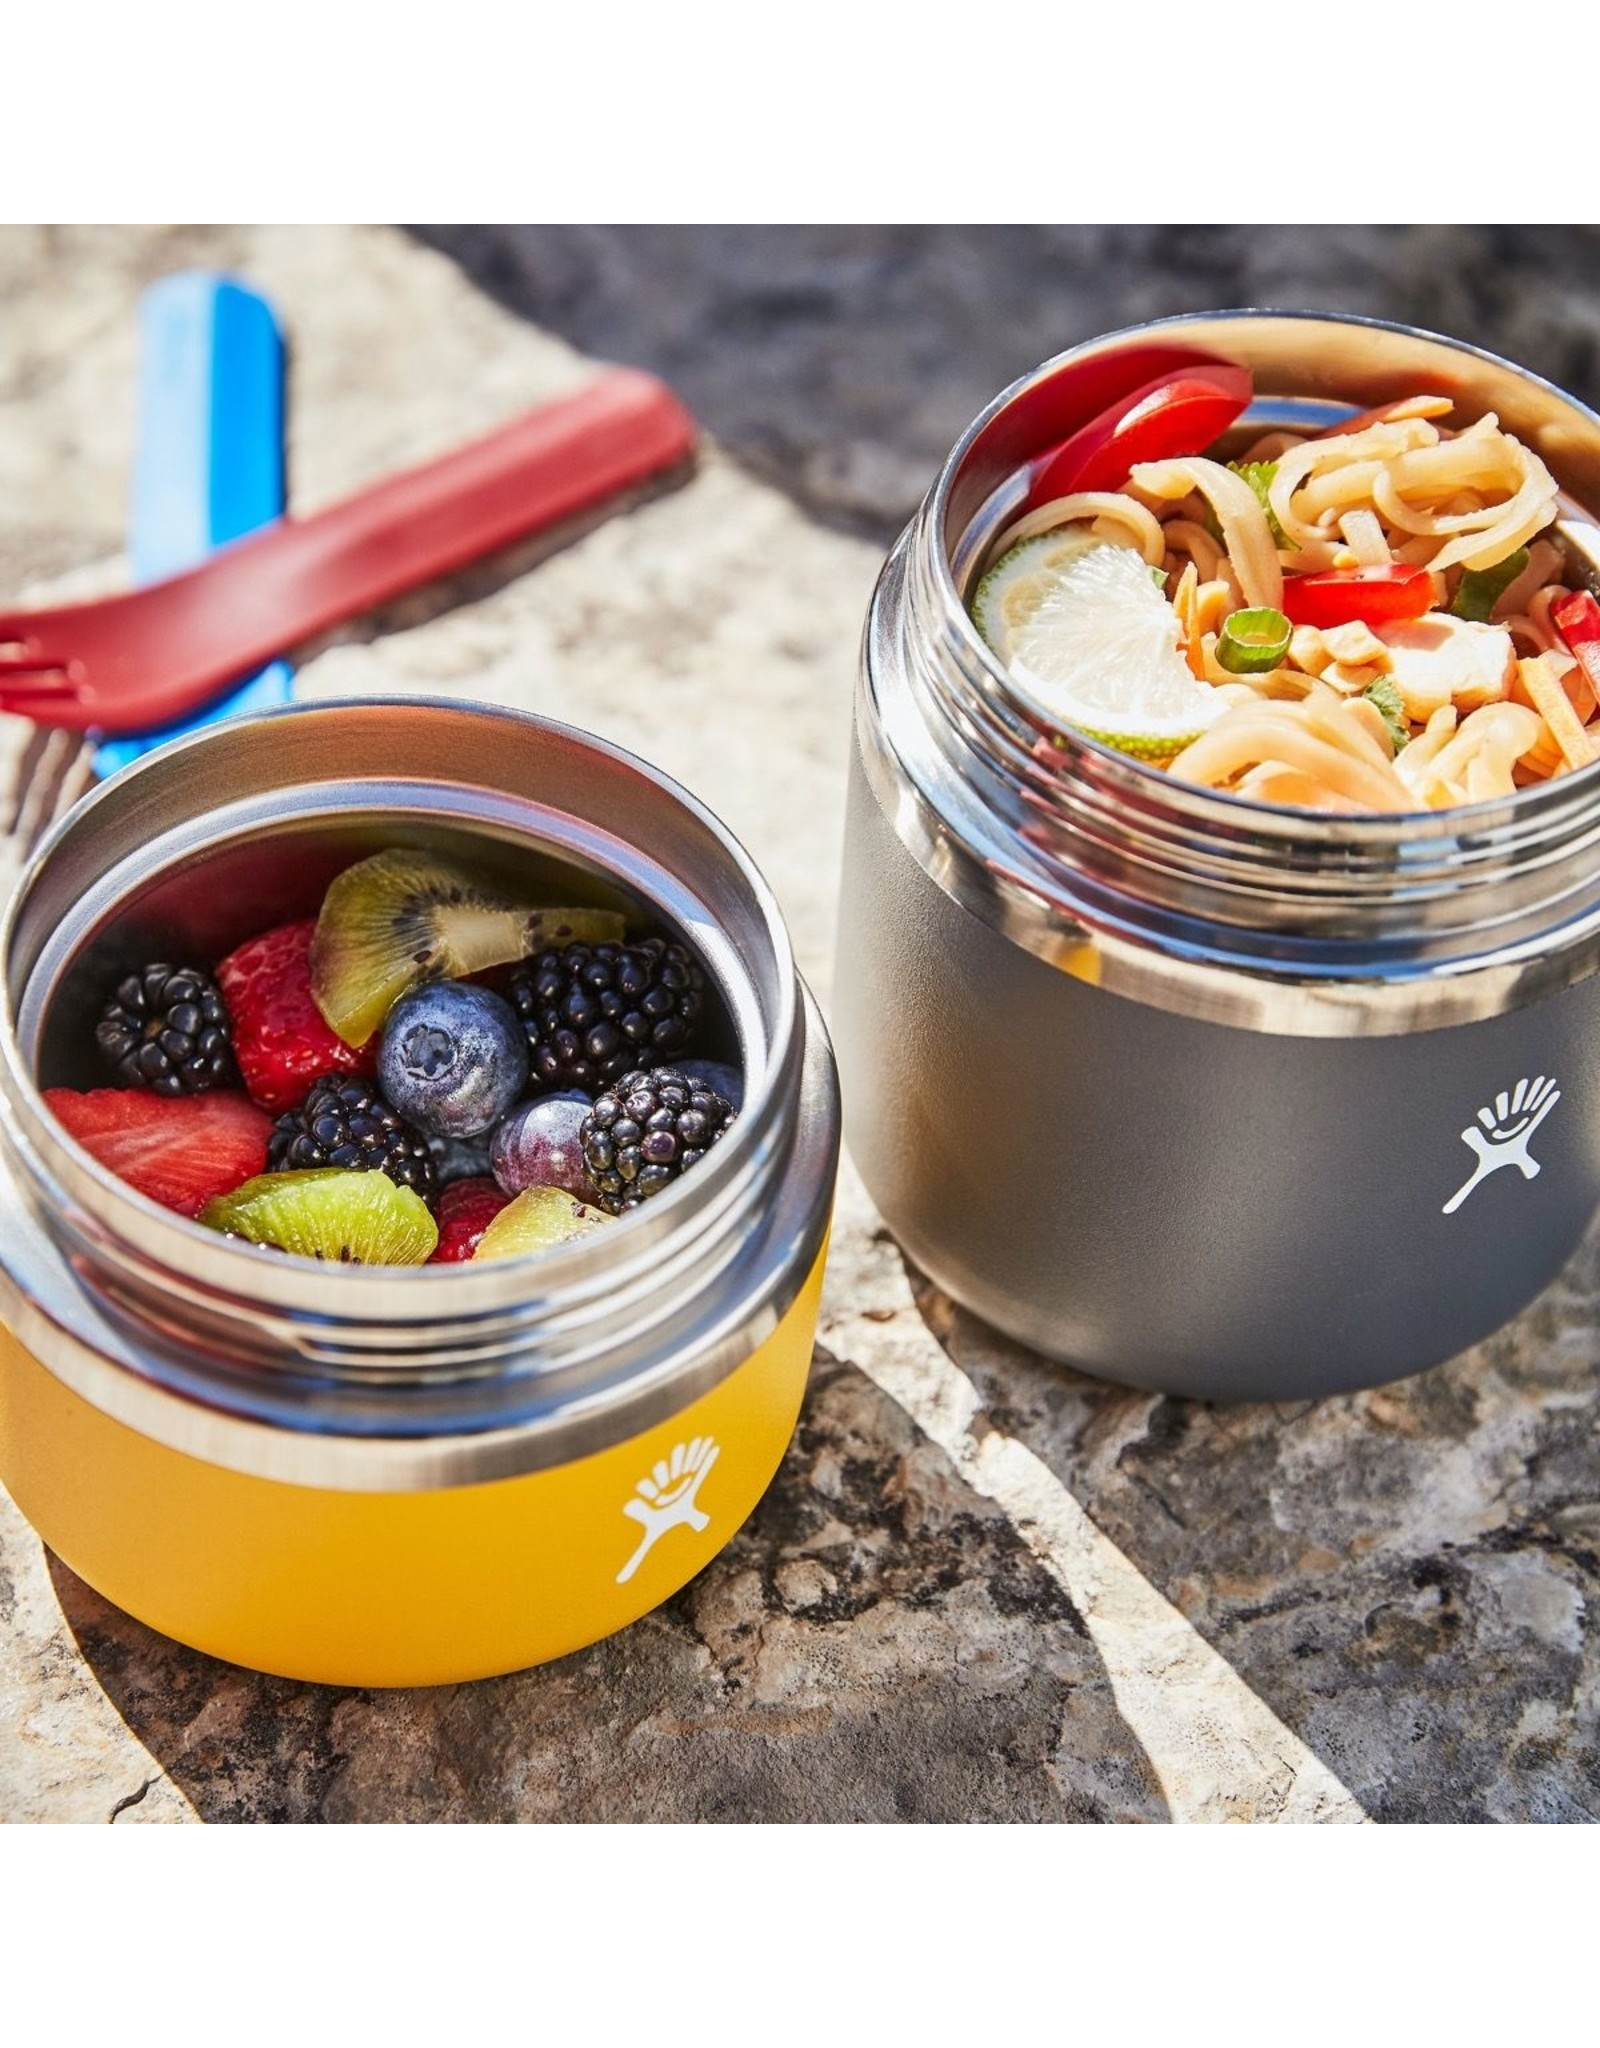 Hydro Flask Hydro Flask 20oz Insulated Food Jar Stone